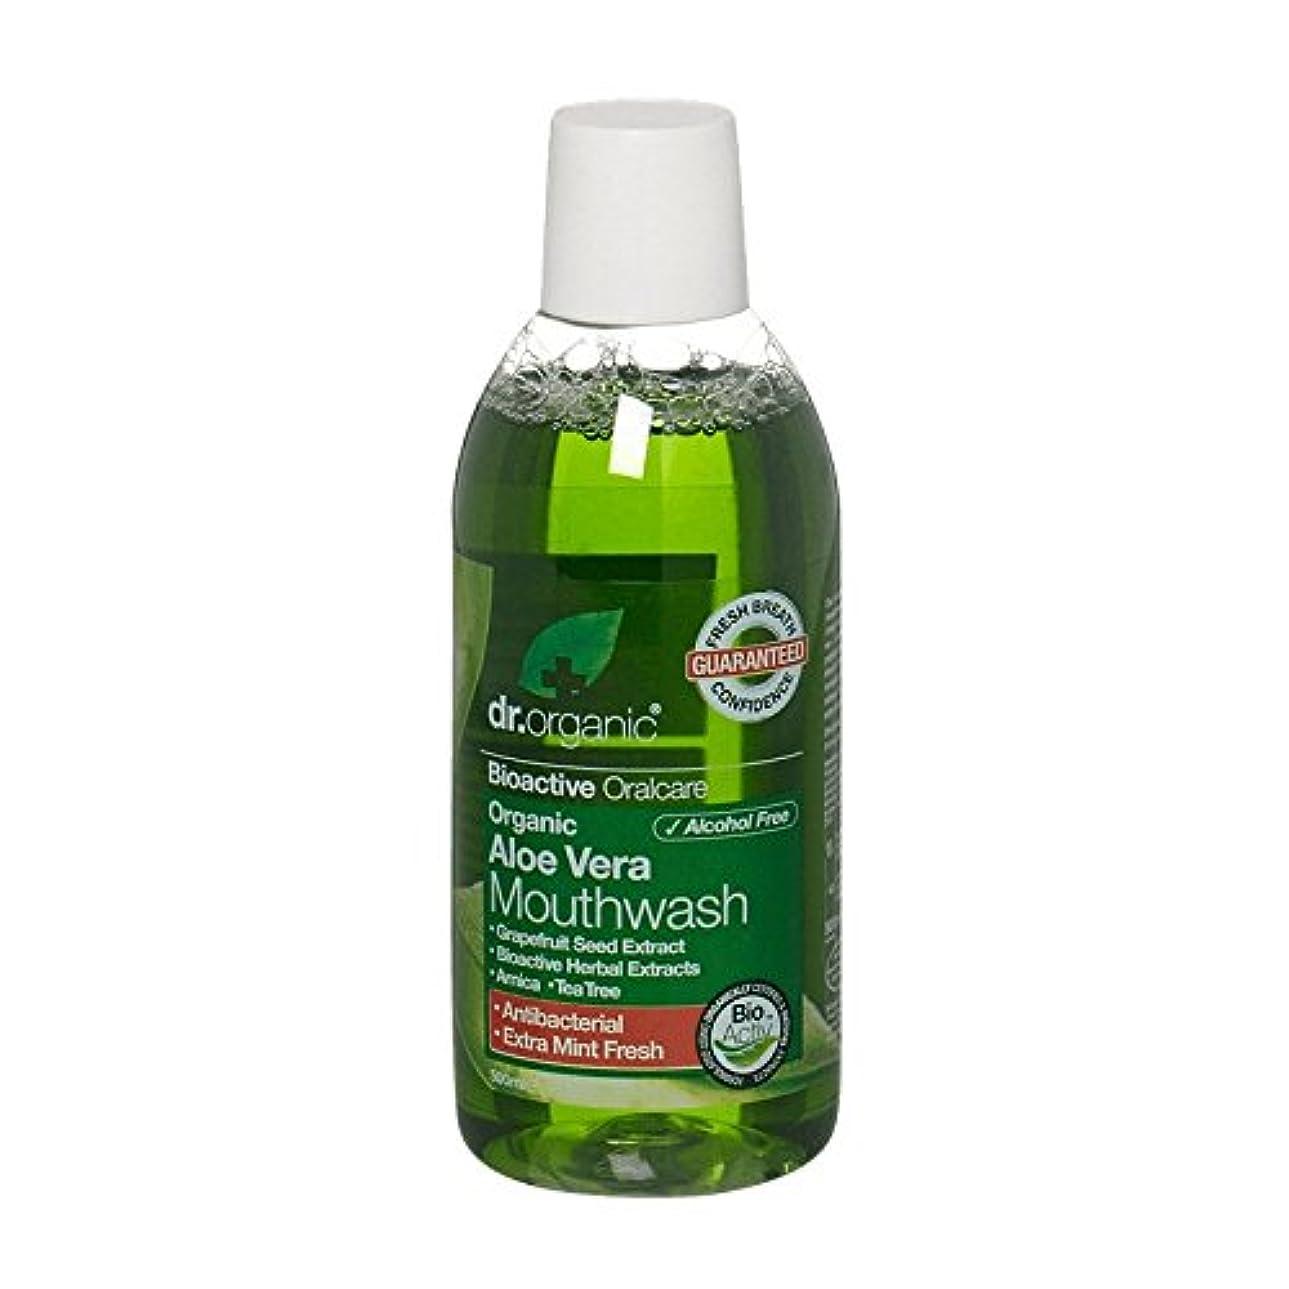 Dr Organic Aloe Vera Mouthwash (Pack of 6) - Dr有機アロエベラ洗口液 (x6) [並行輸入品]